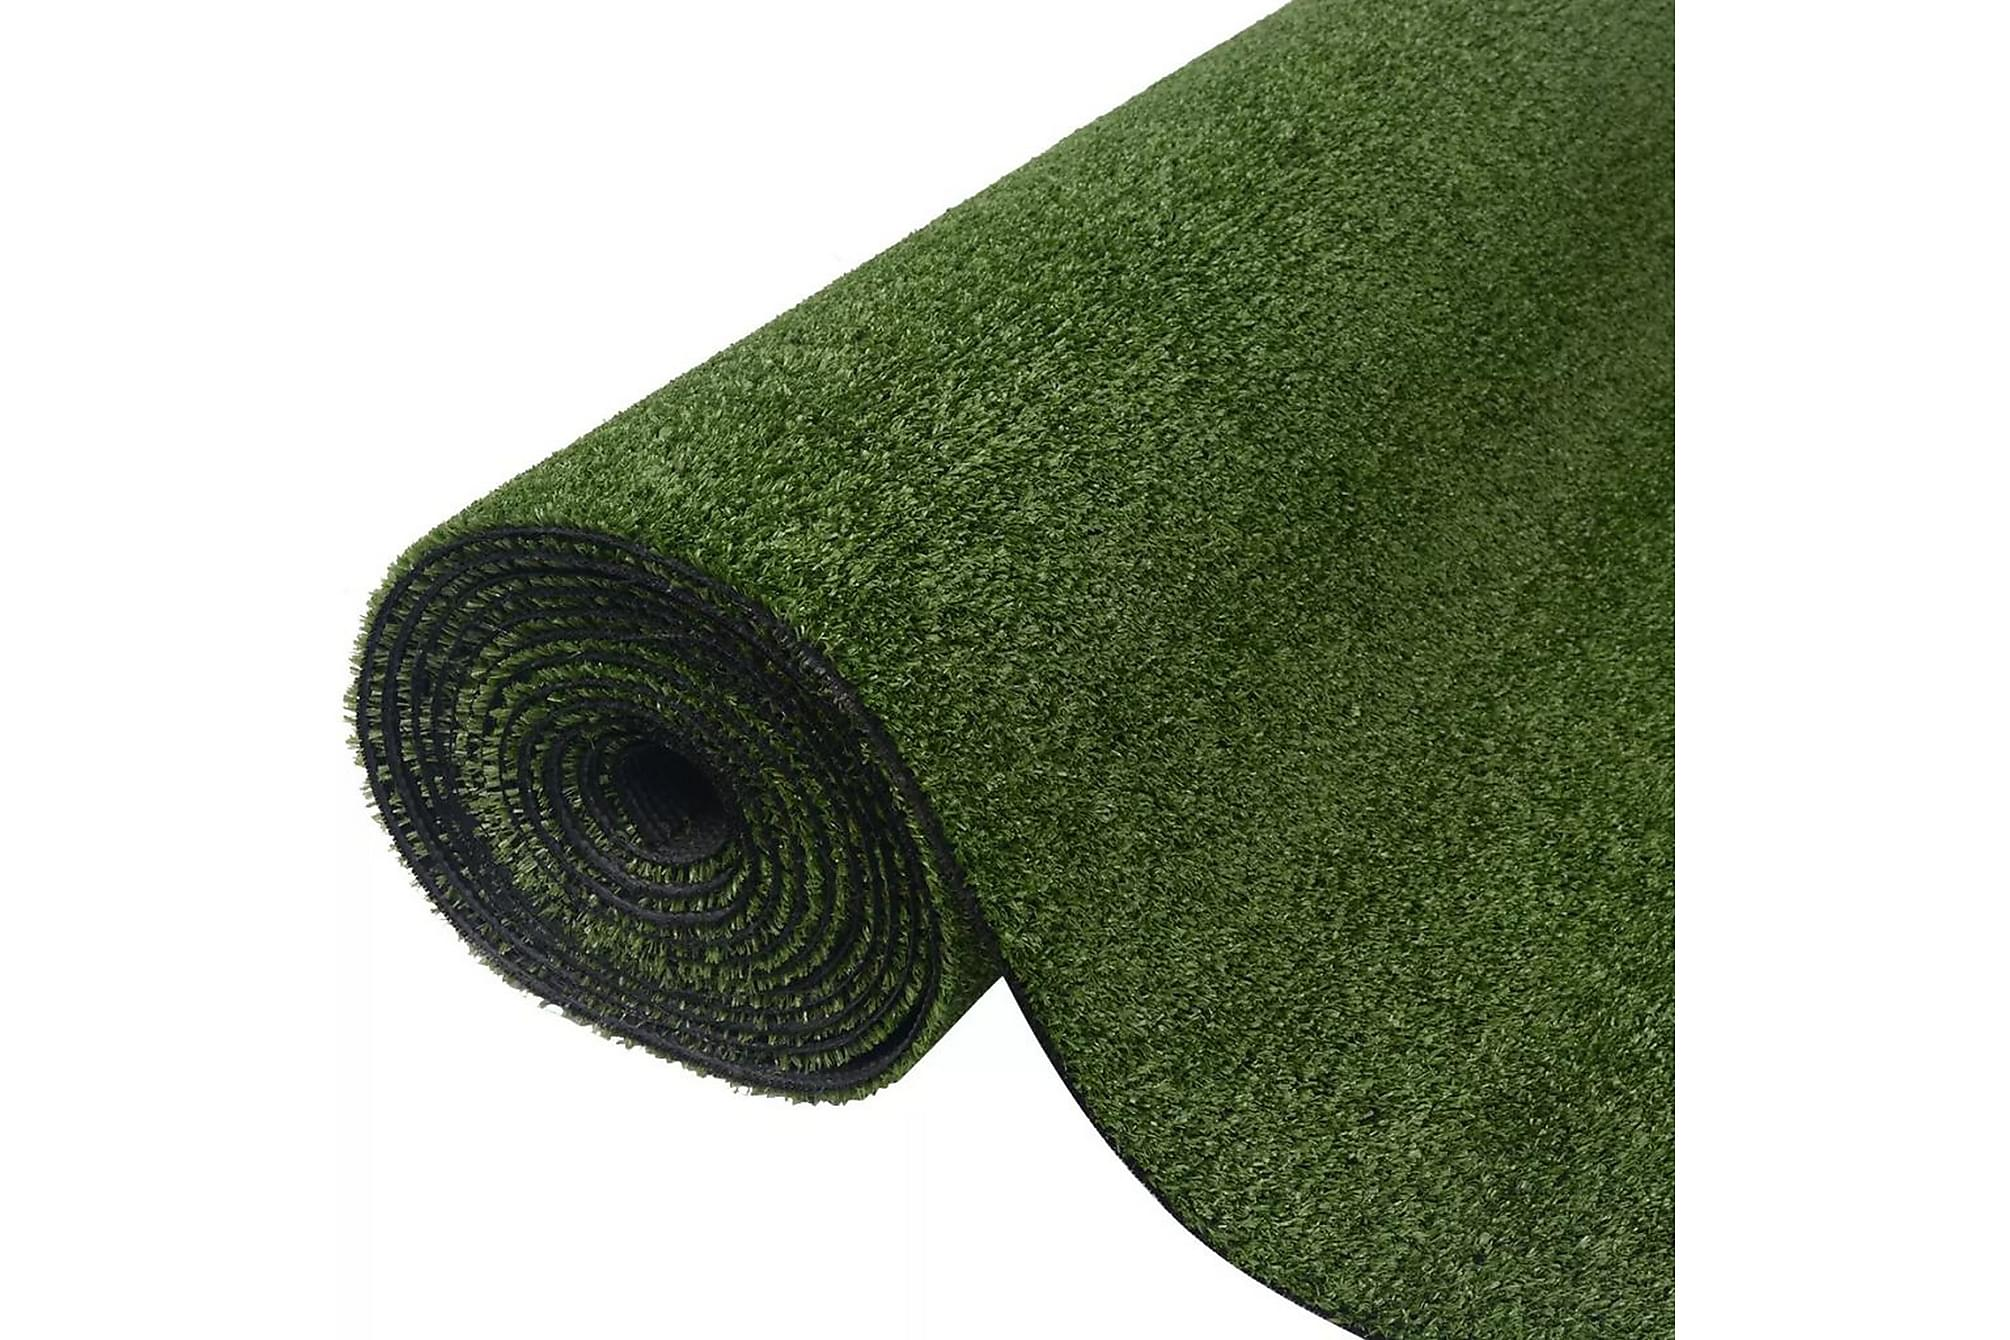 Konstgräsmatta 1×5 m/7-9 mm grön